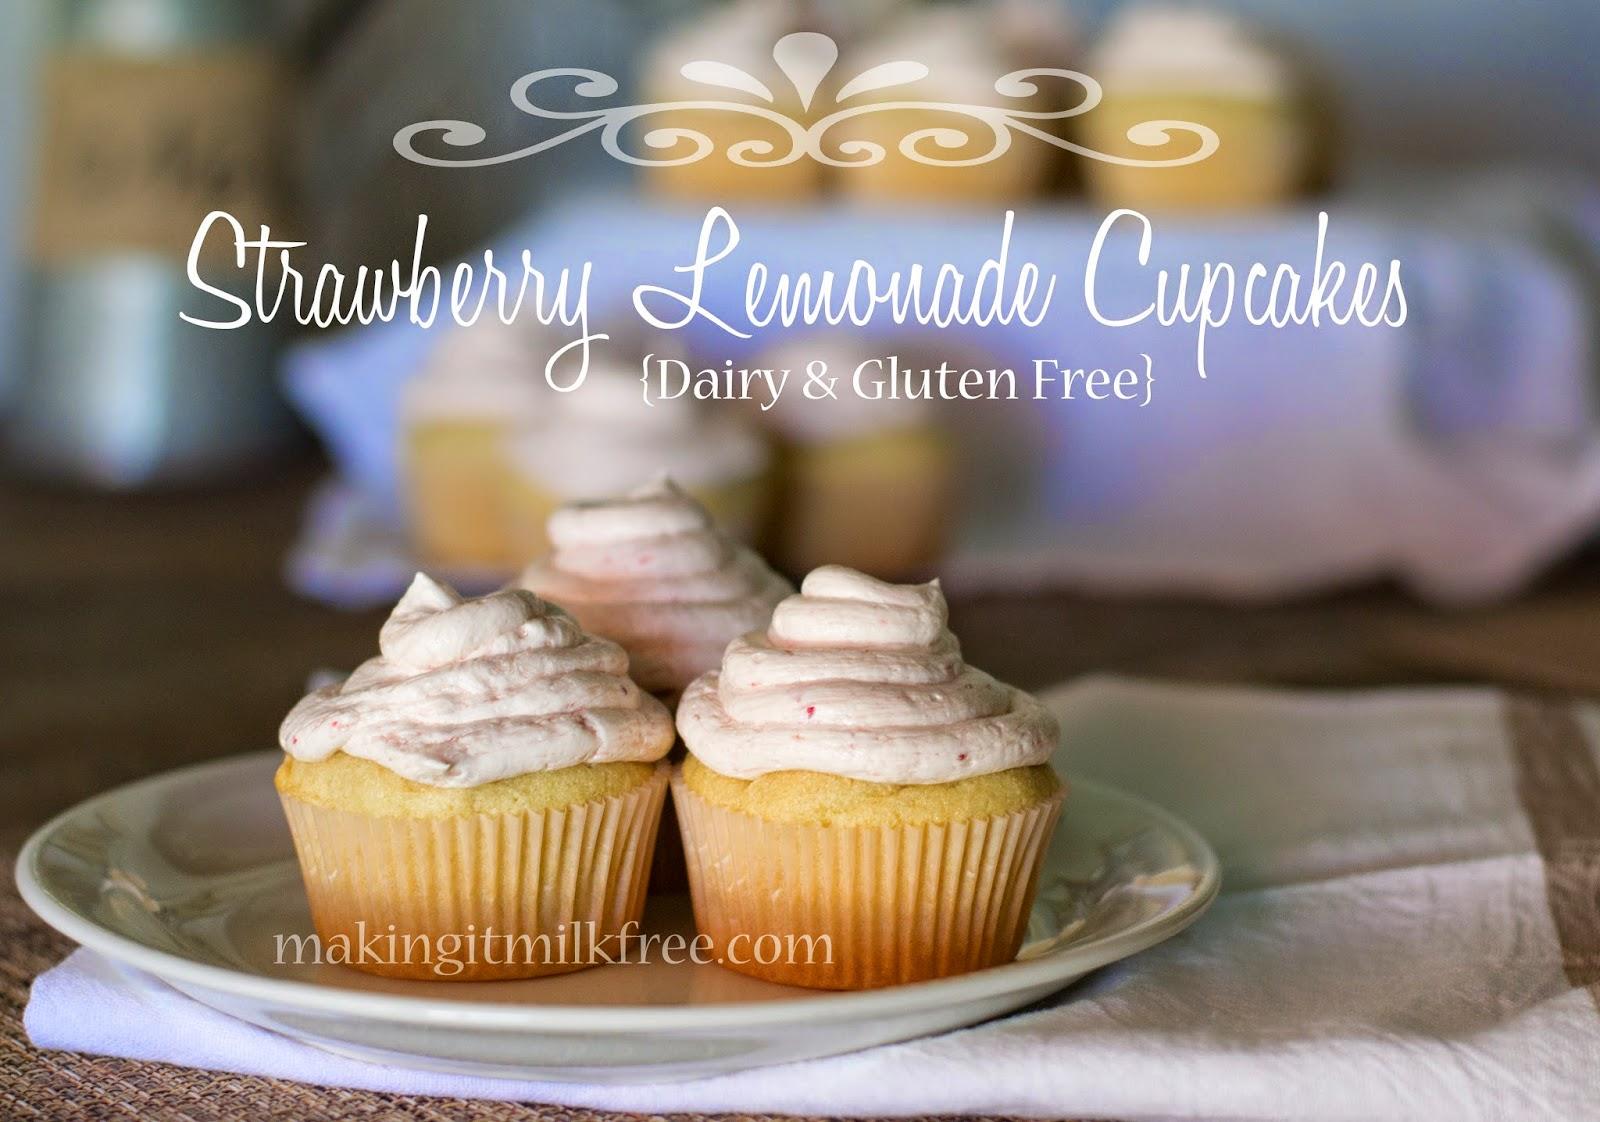 #glutenfree #dairyfree #cupcakes #strawberry #lemonade